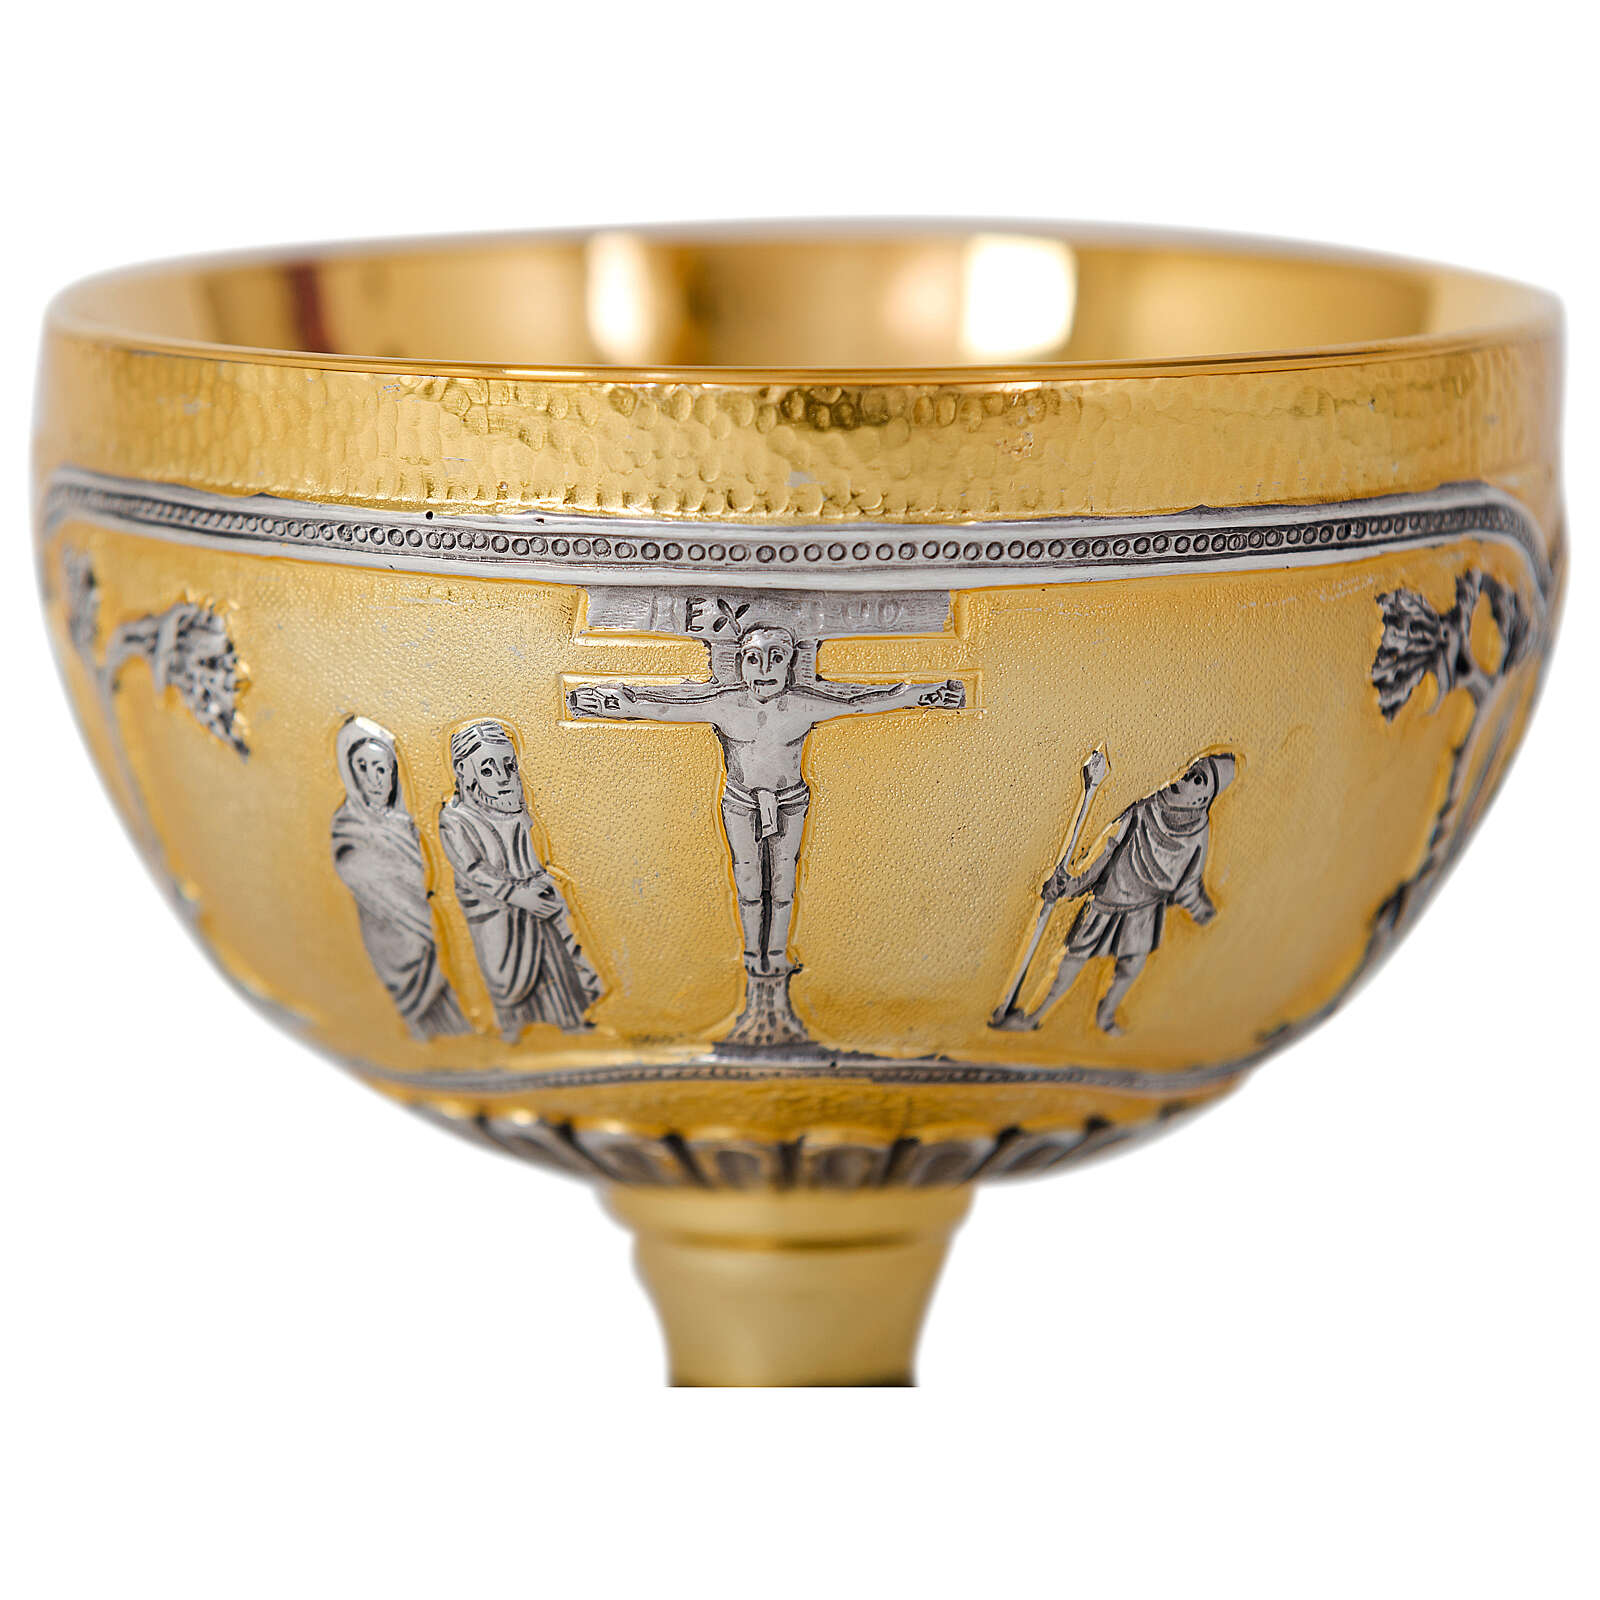 Brass chalice ciborium paten Crucifixion Last Supper Evangelists silver cup 4